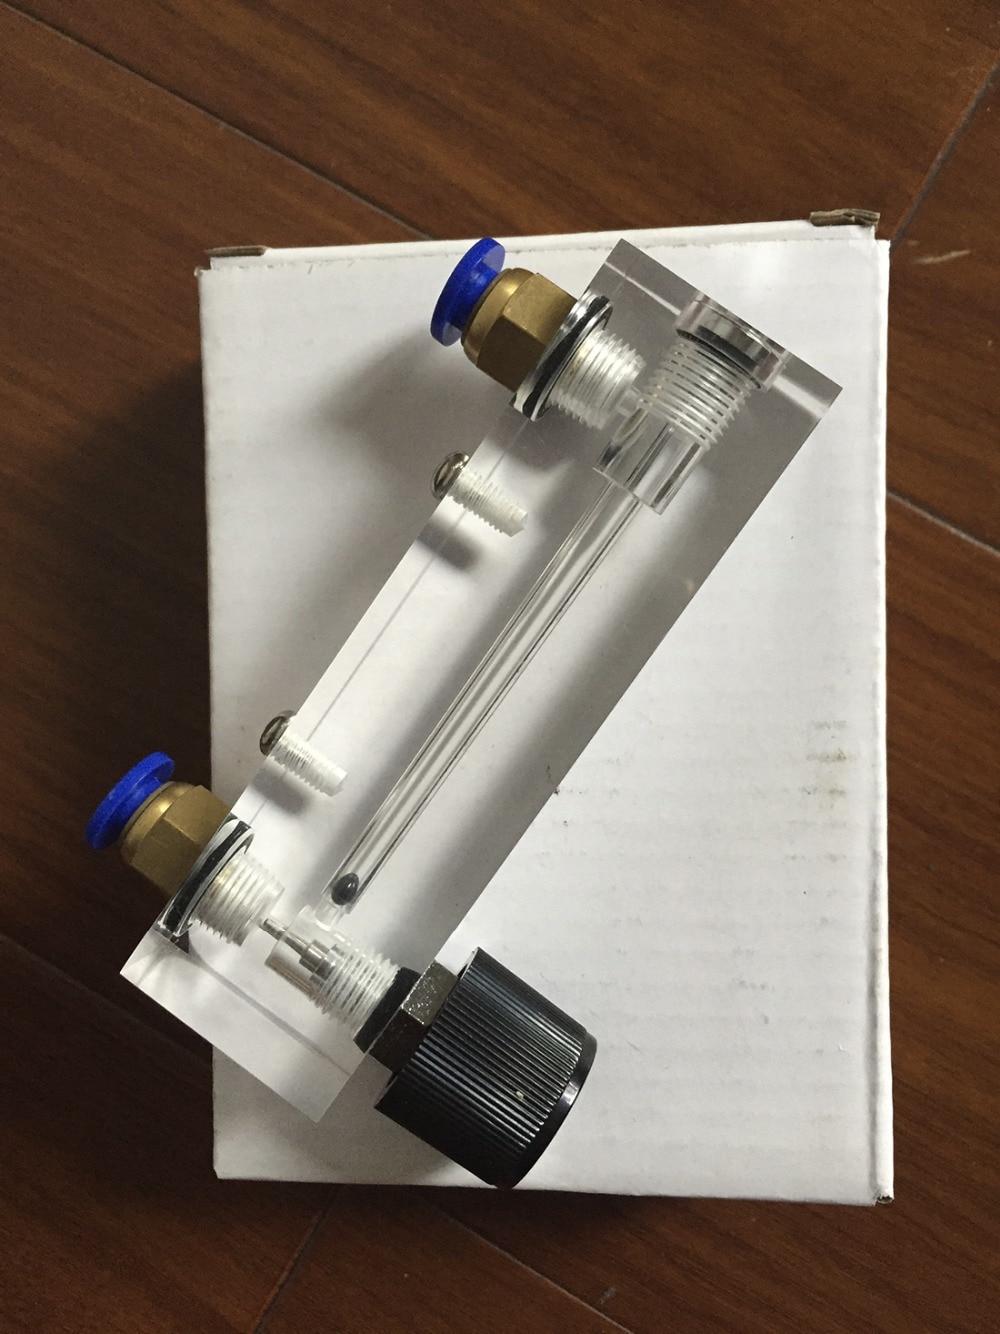 LZT-4T 0.2-2 LPM 0.2-2L/min Square Panel Gas liquid Flowmeter Flow Meter rotameter LZT4T Tools Flow Measuring  цены